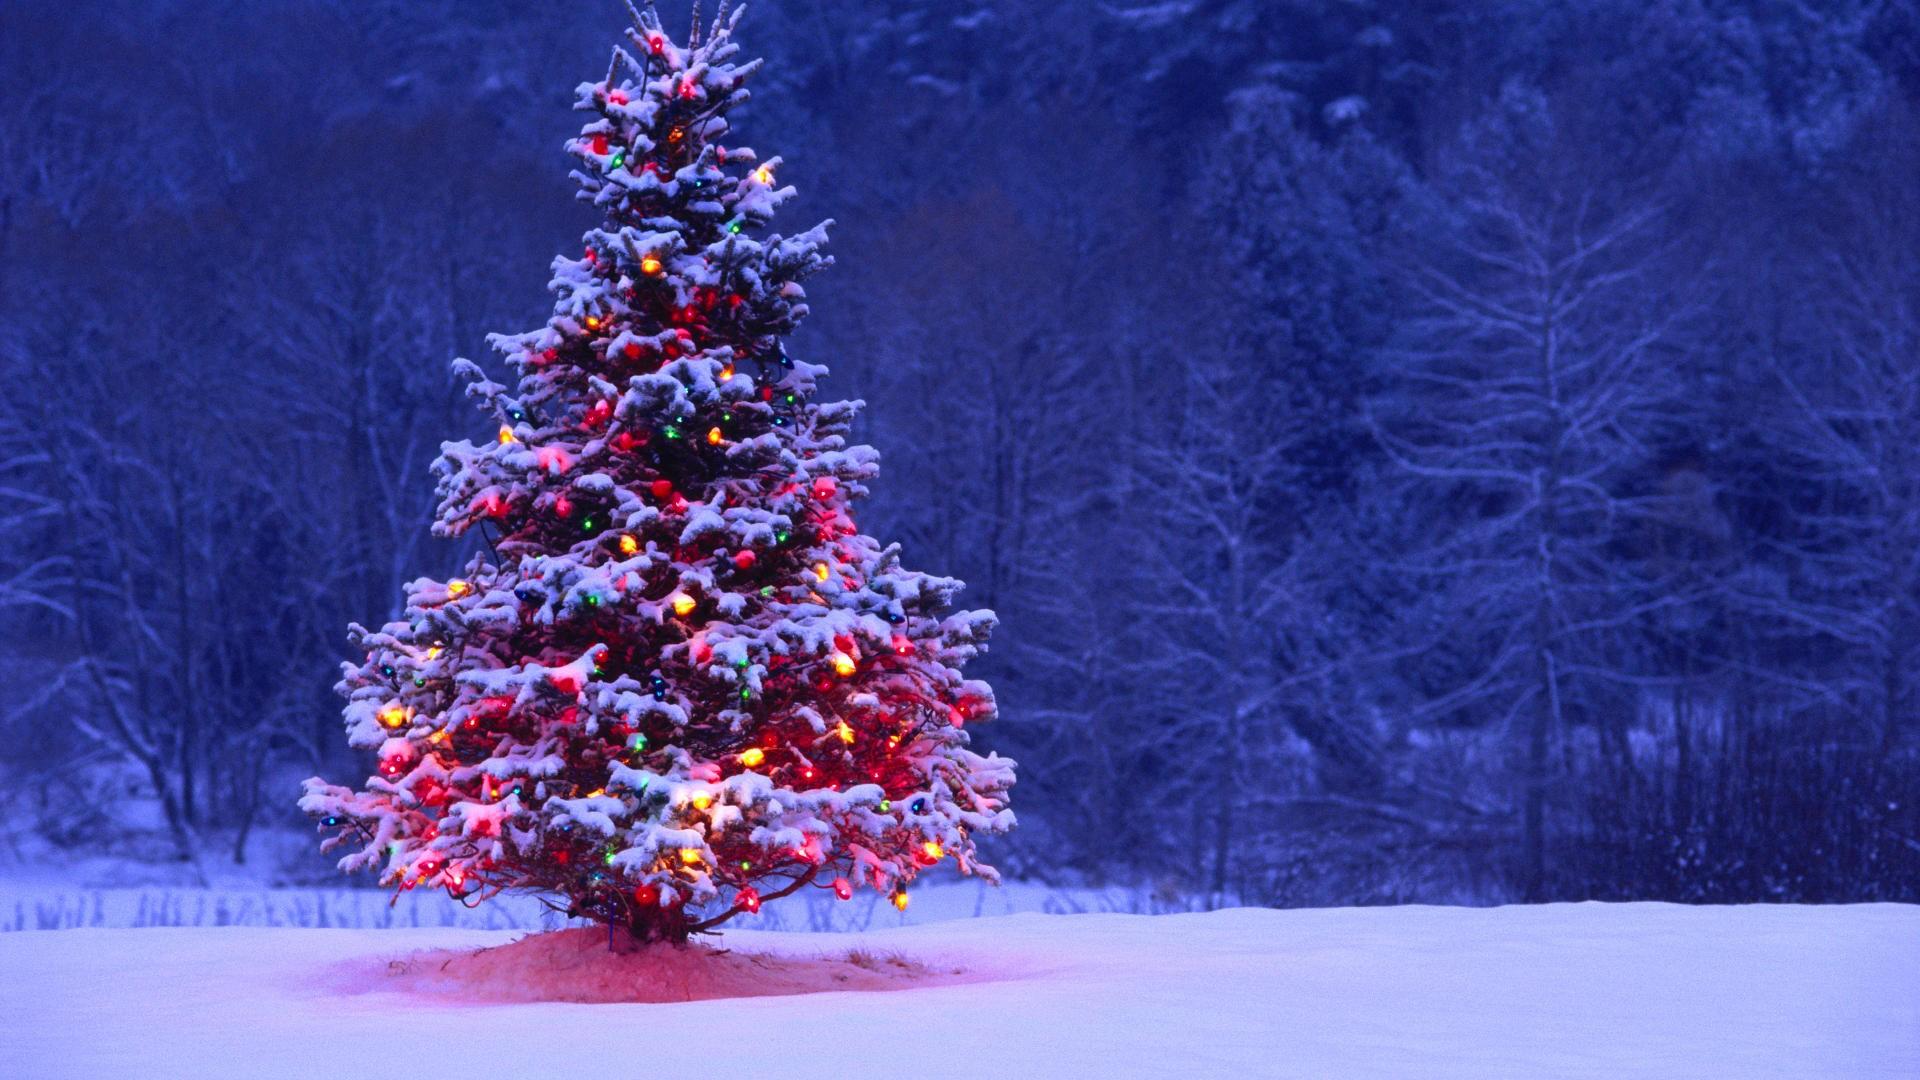 christmas tree hd wallpapers best desktop images widescreen christmas 42726472 1920 1080